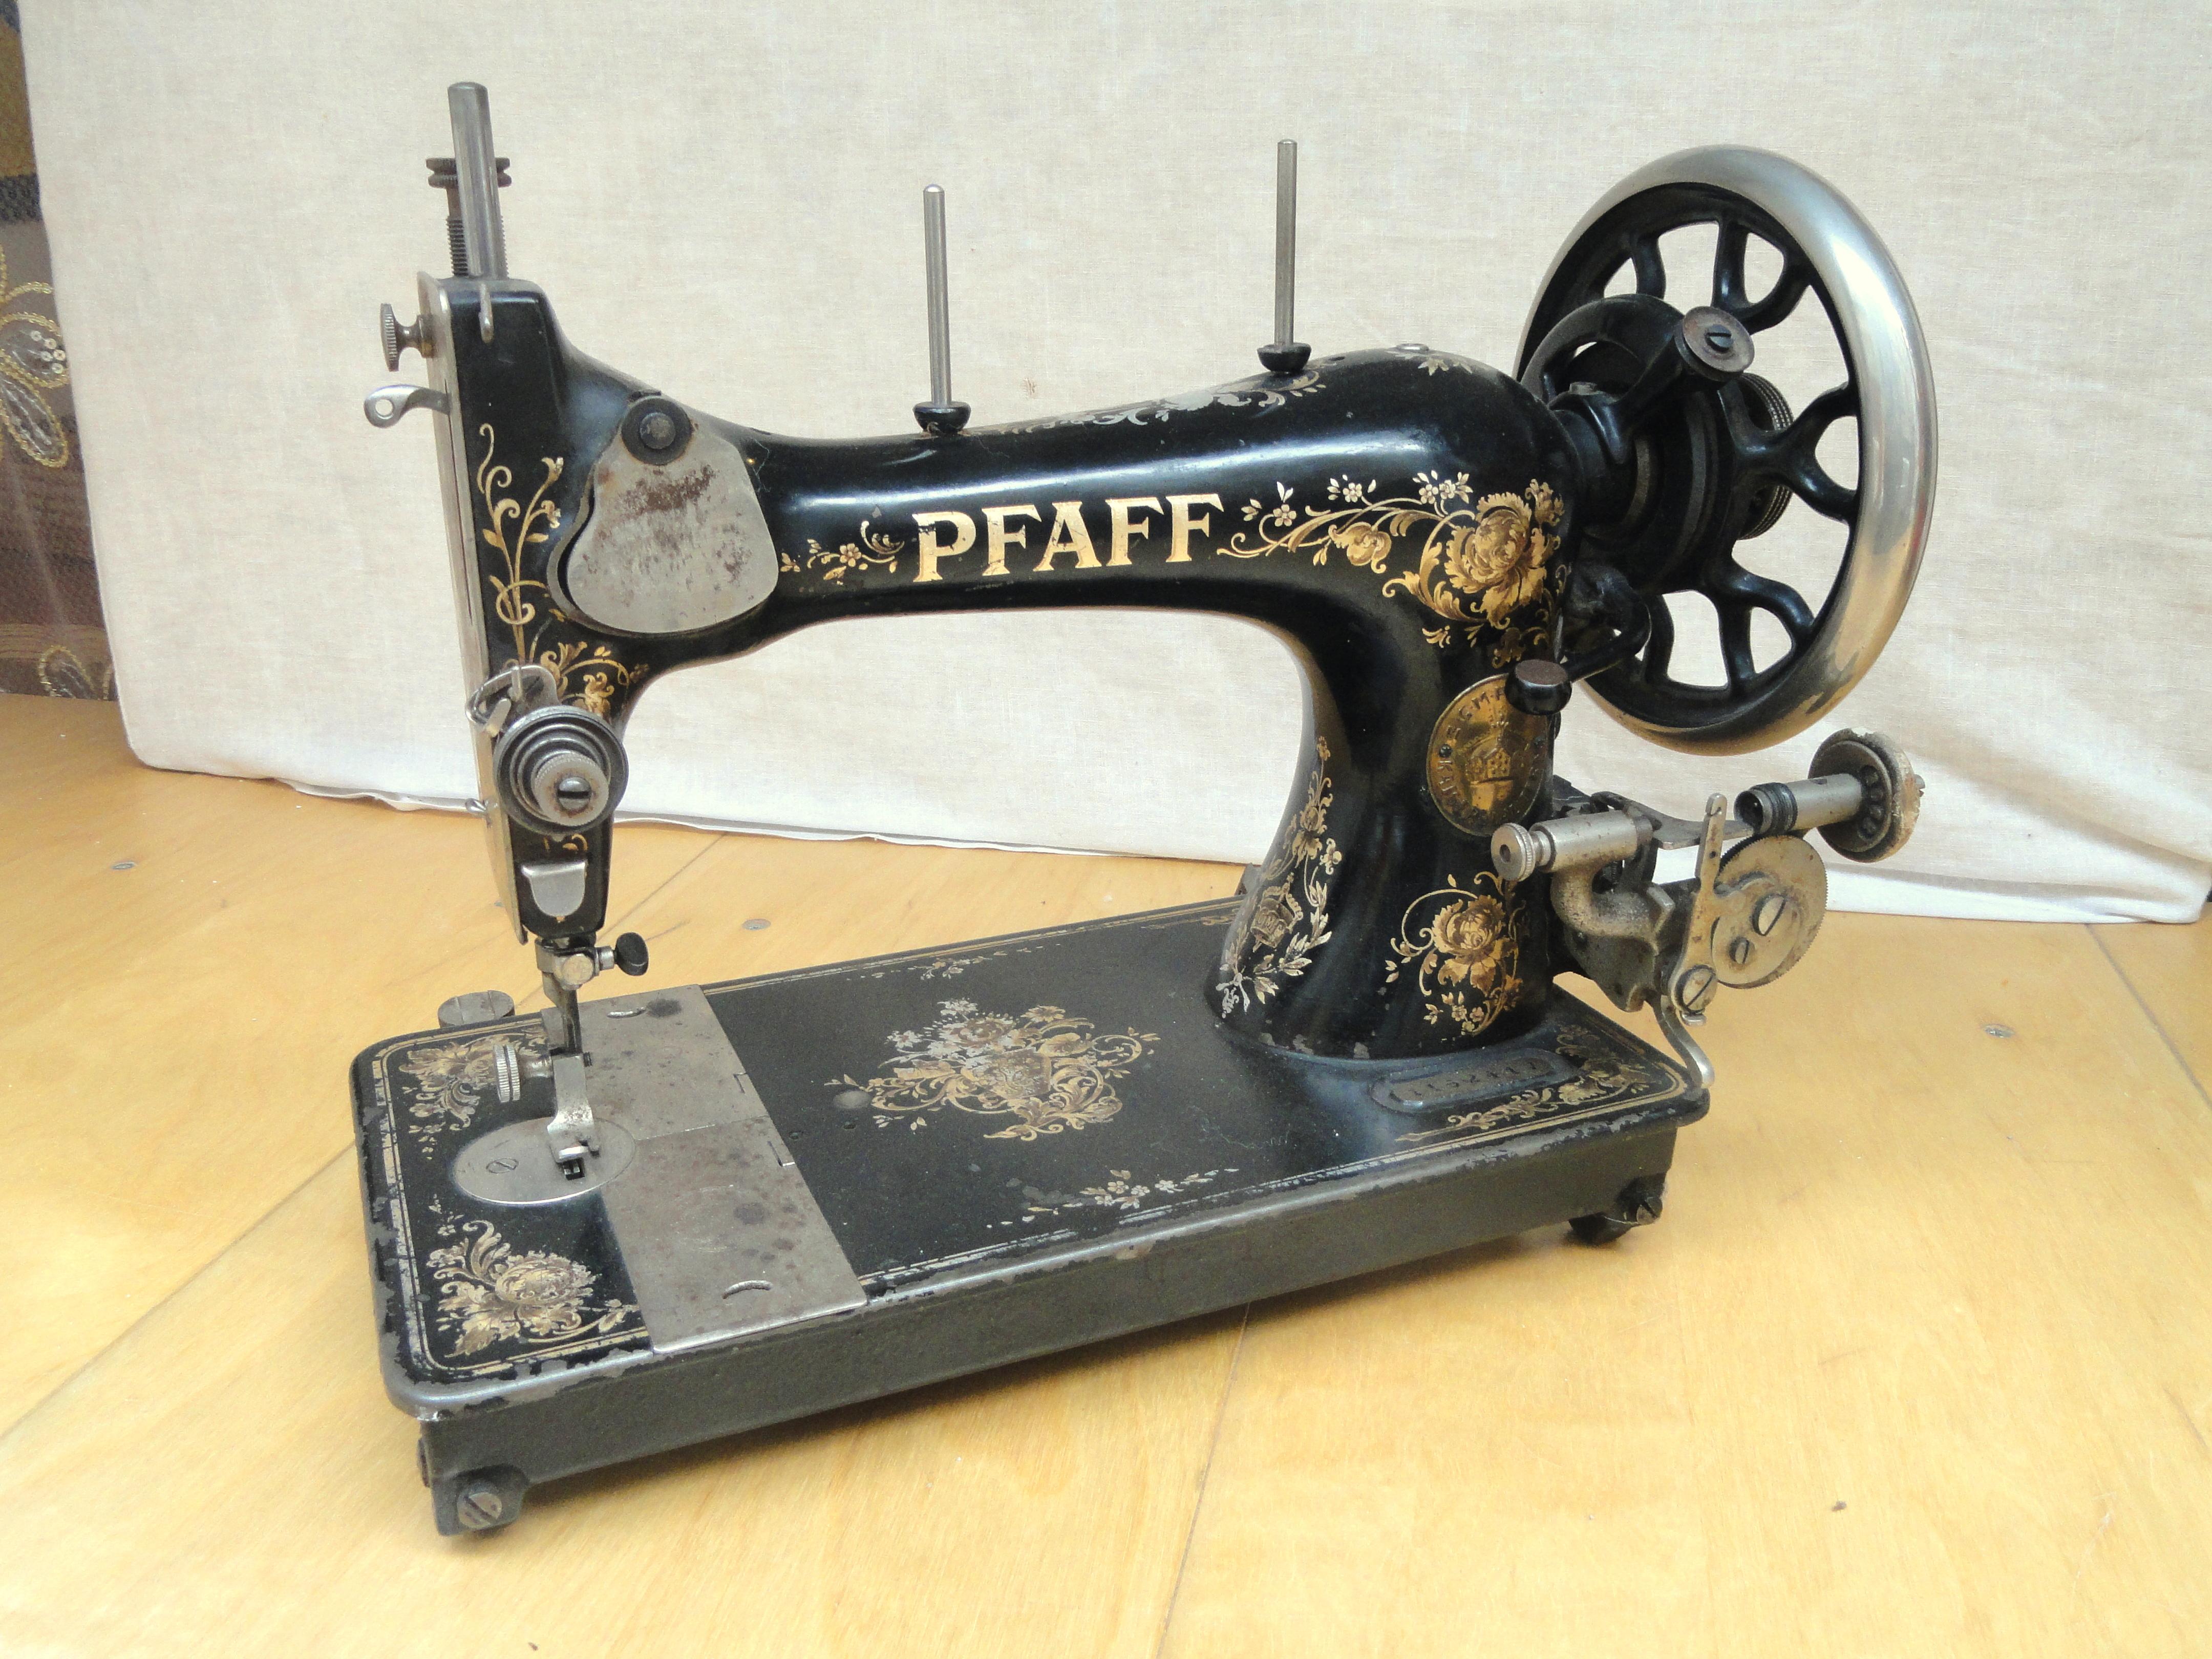 Pfaff Sewing Machine Service Near Vero Beach